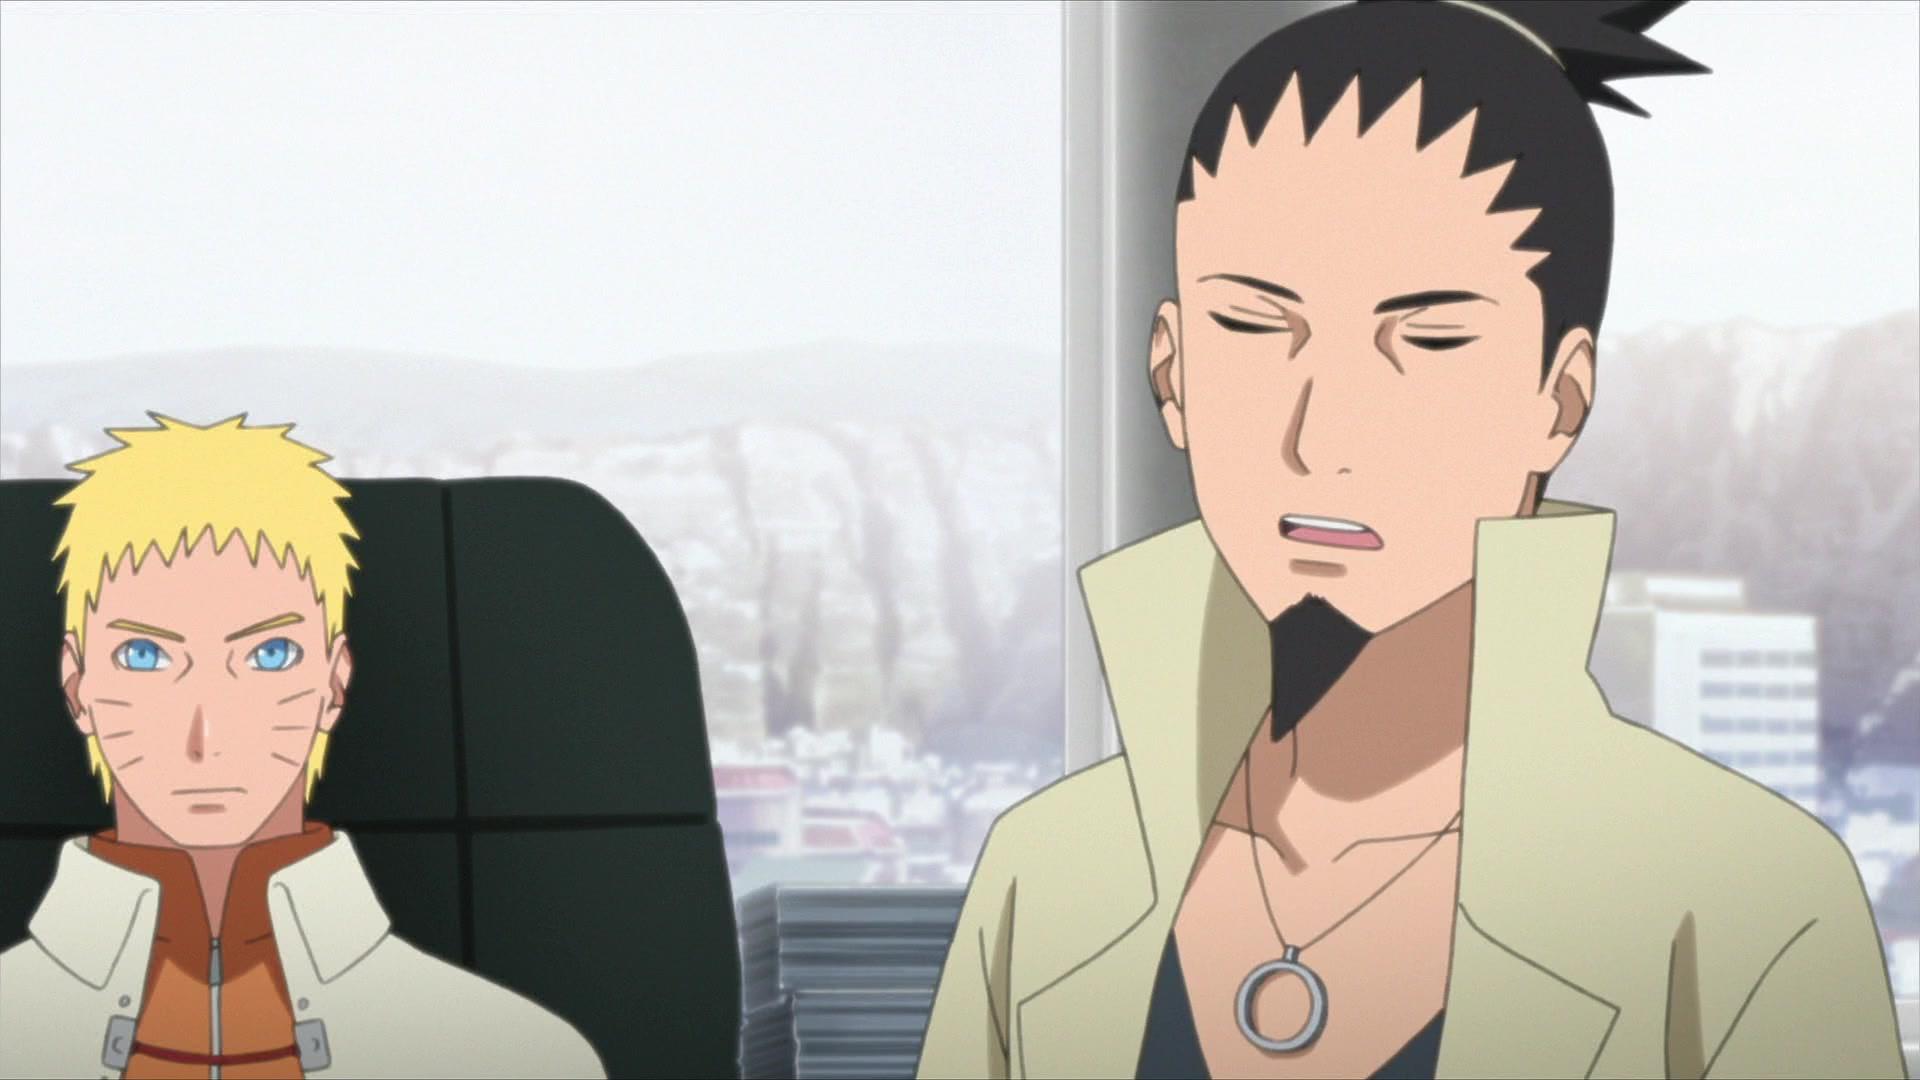 Boruto Episode 40 English Sub Watch Online - ▷ ▷ PowerMall